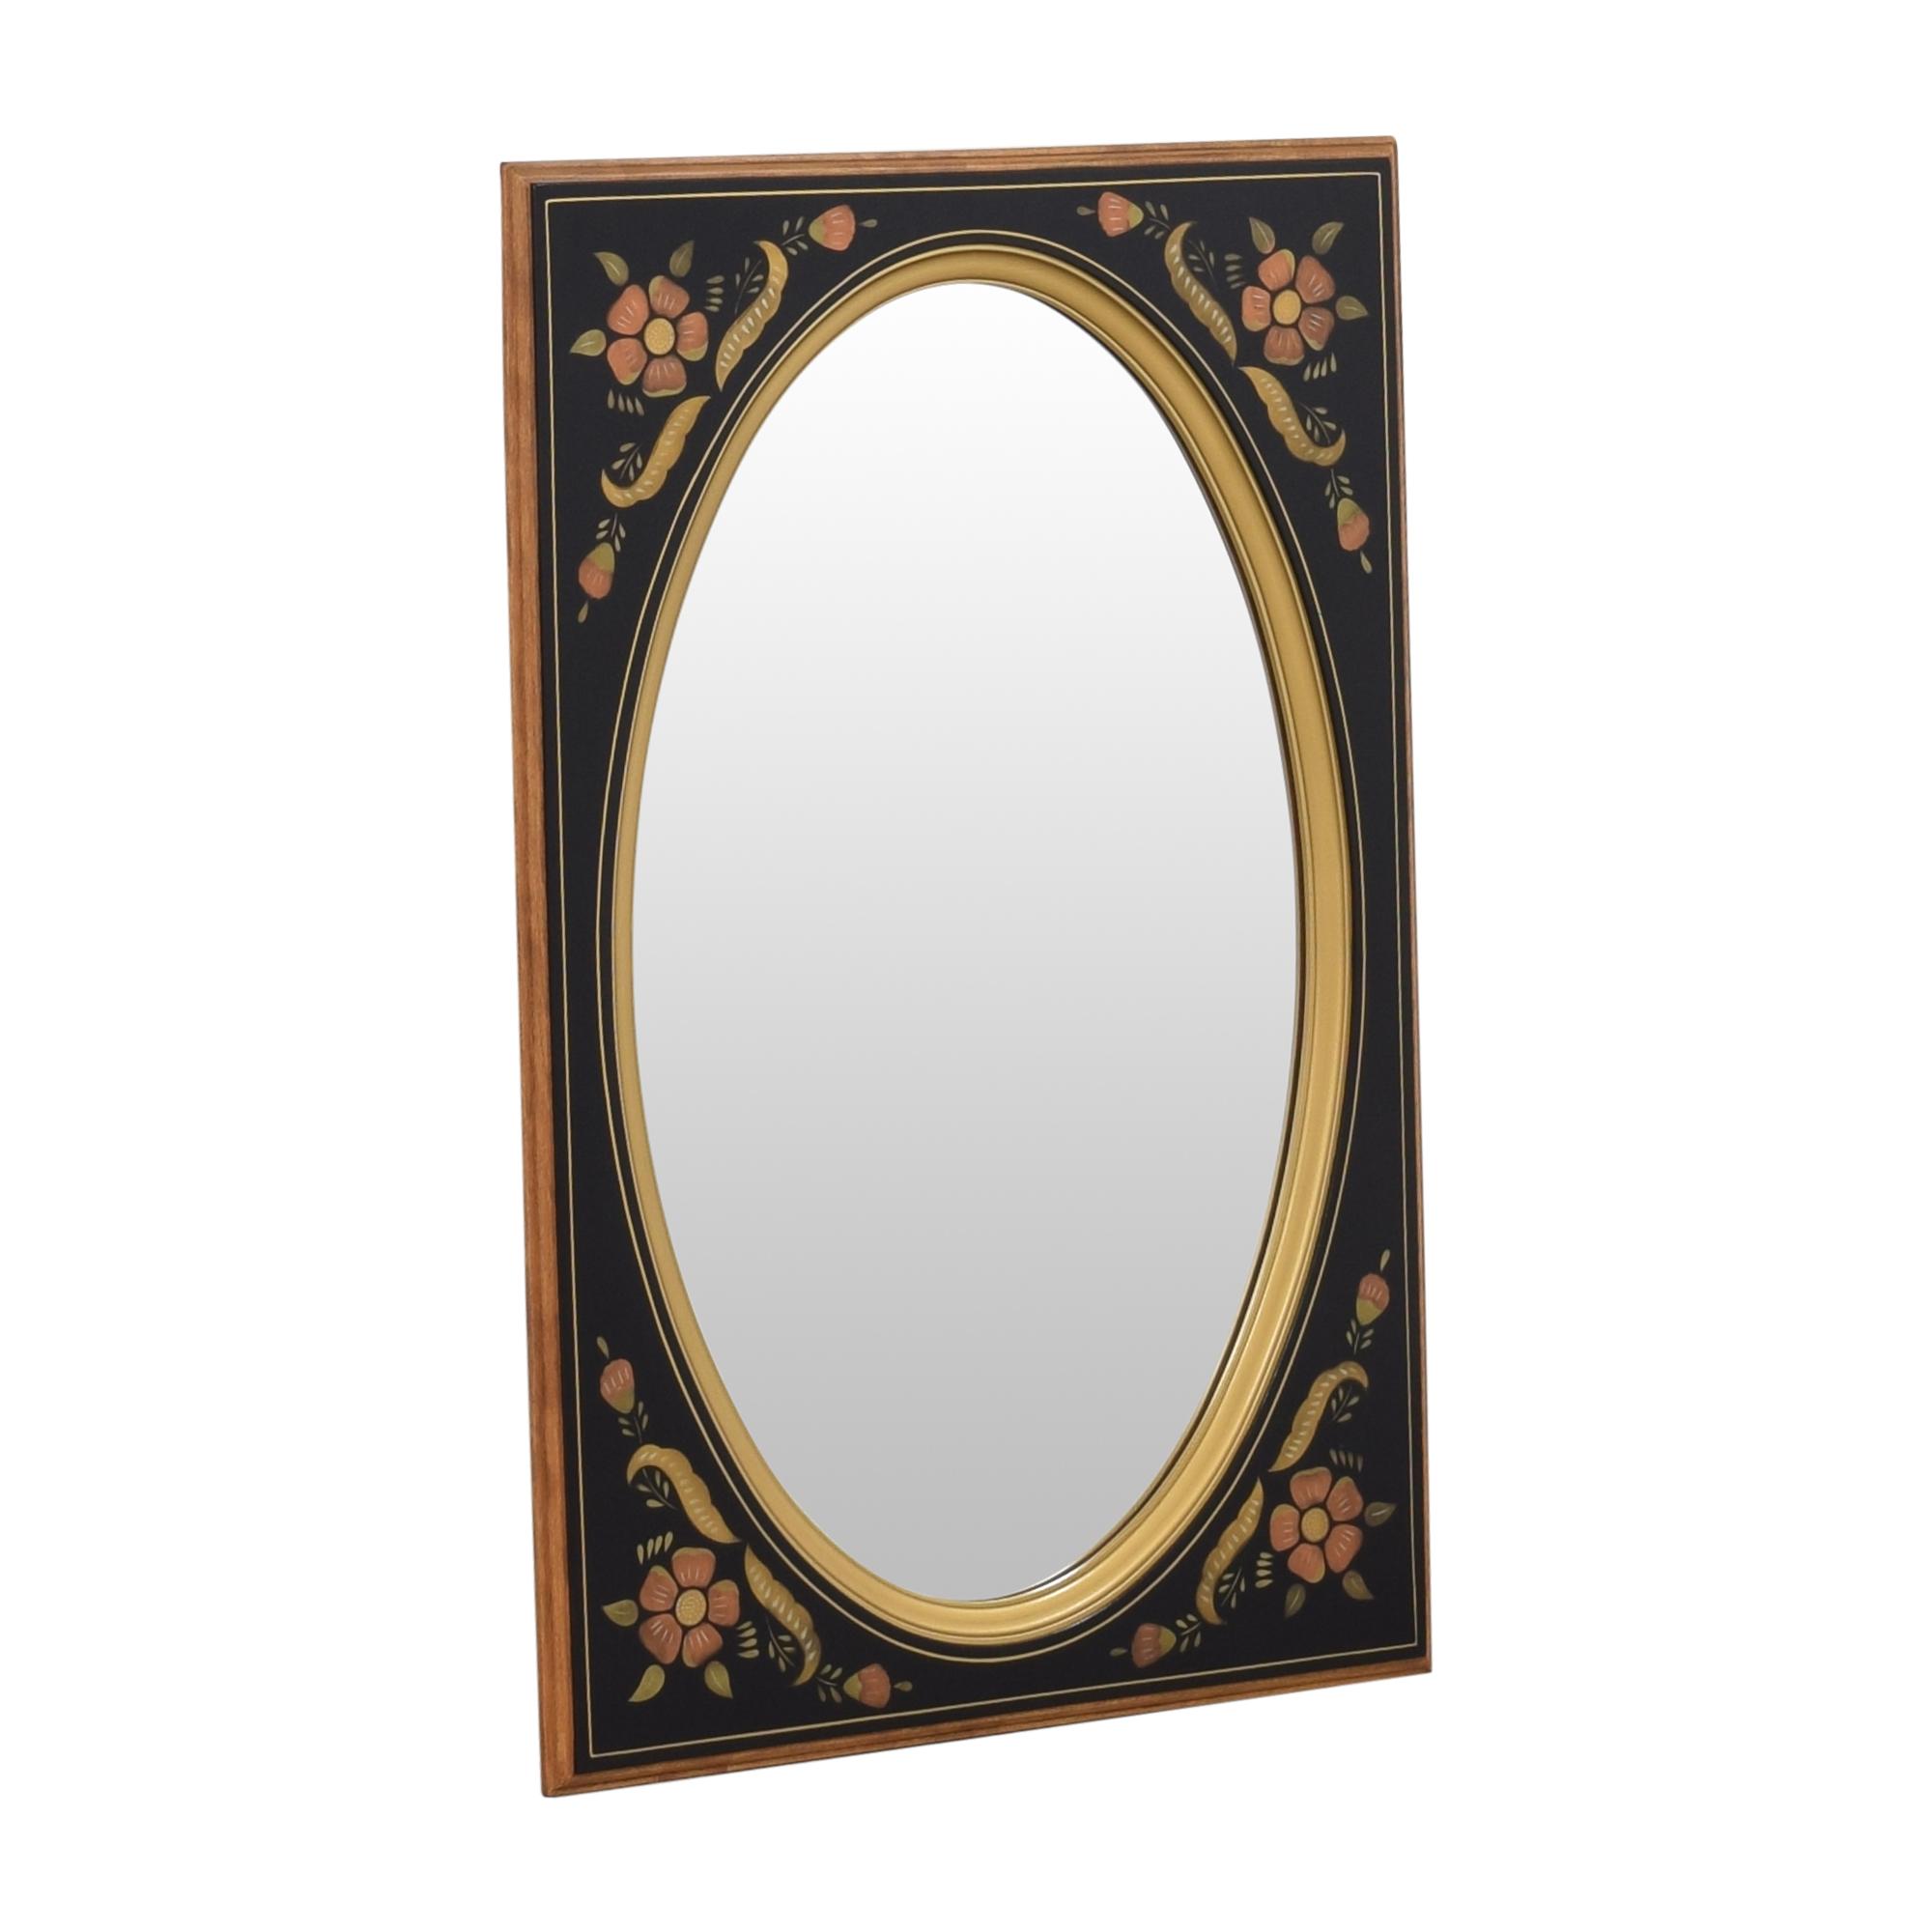 Ethan Allen Ethan Allen Floral Wall Mirror nj